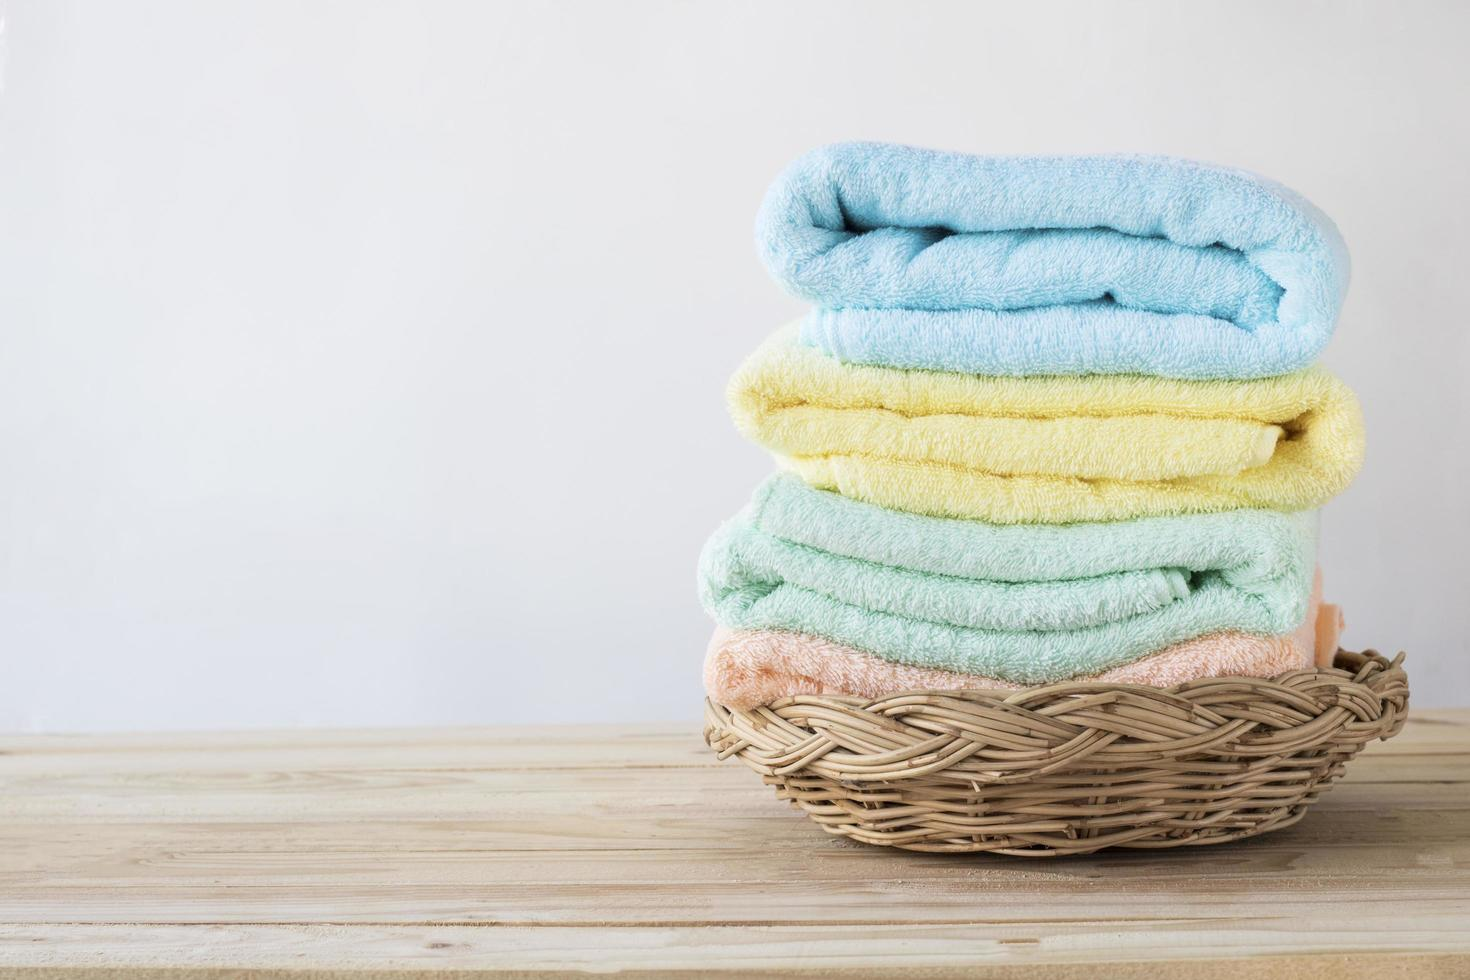 Stapel Handtücher im Weidenkorb foto